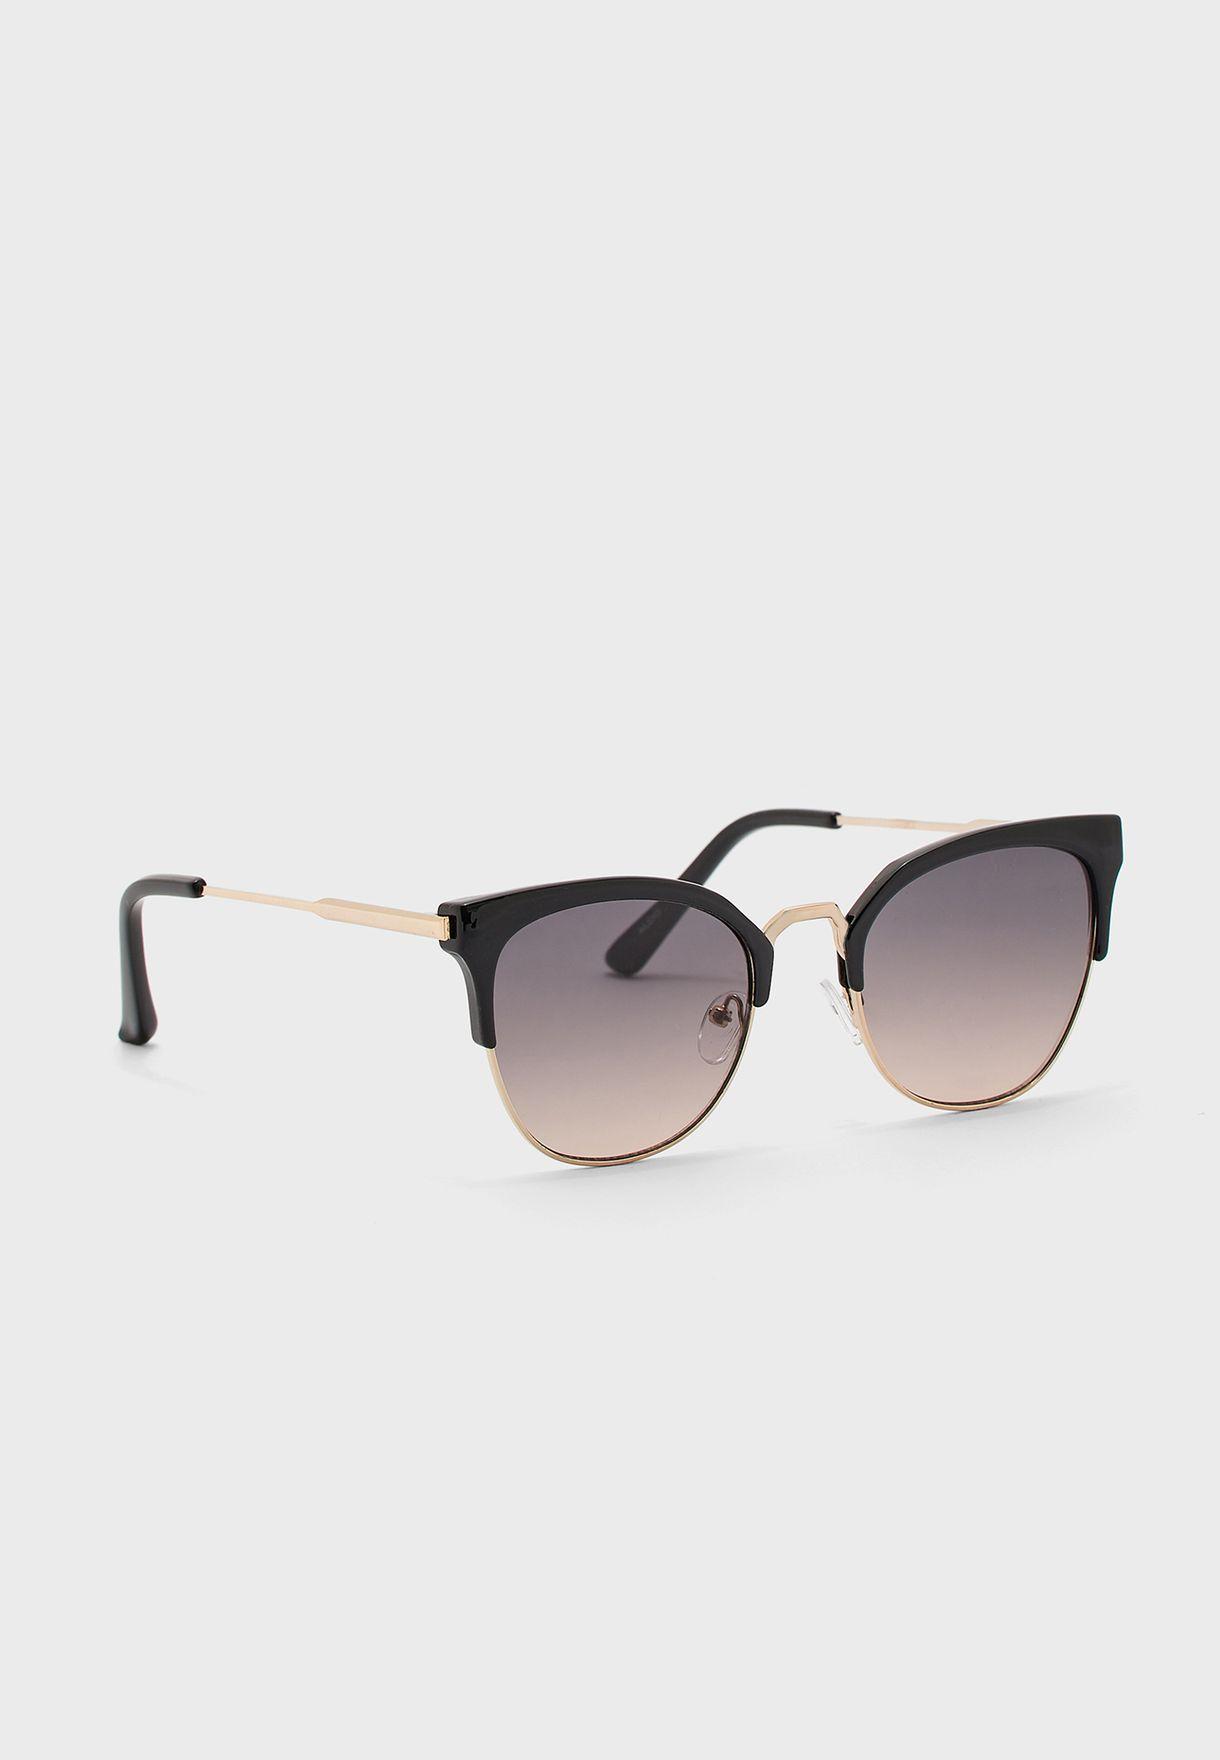 Depera Sunglasses